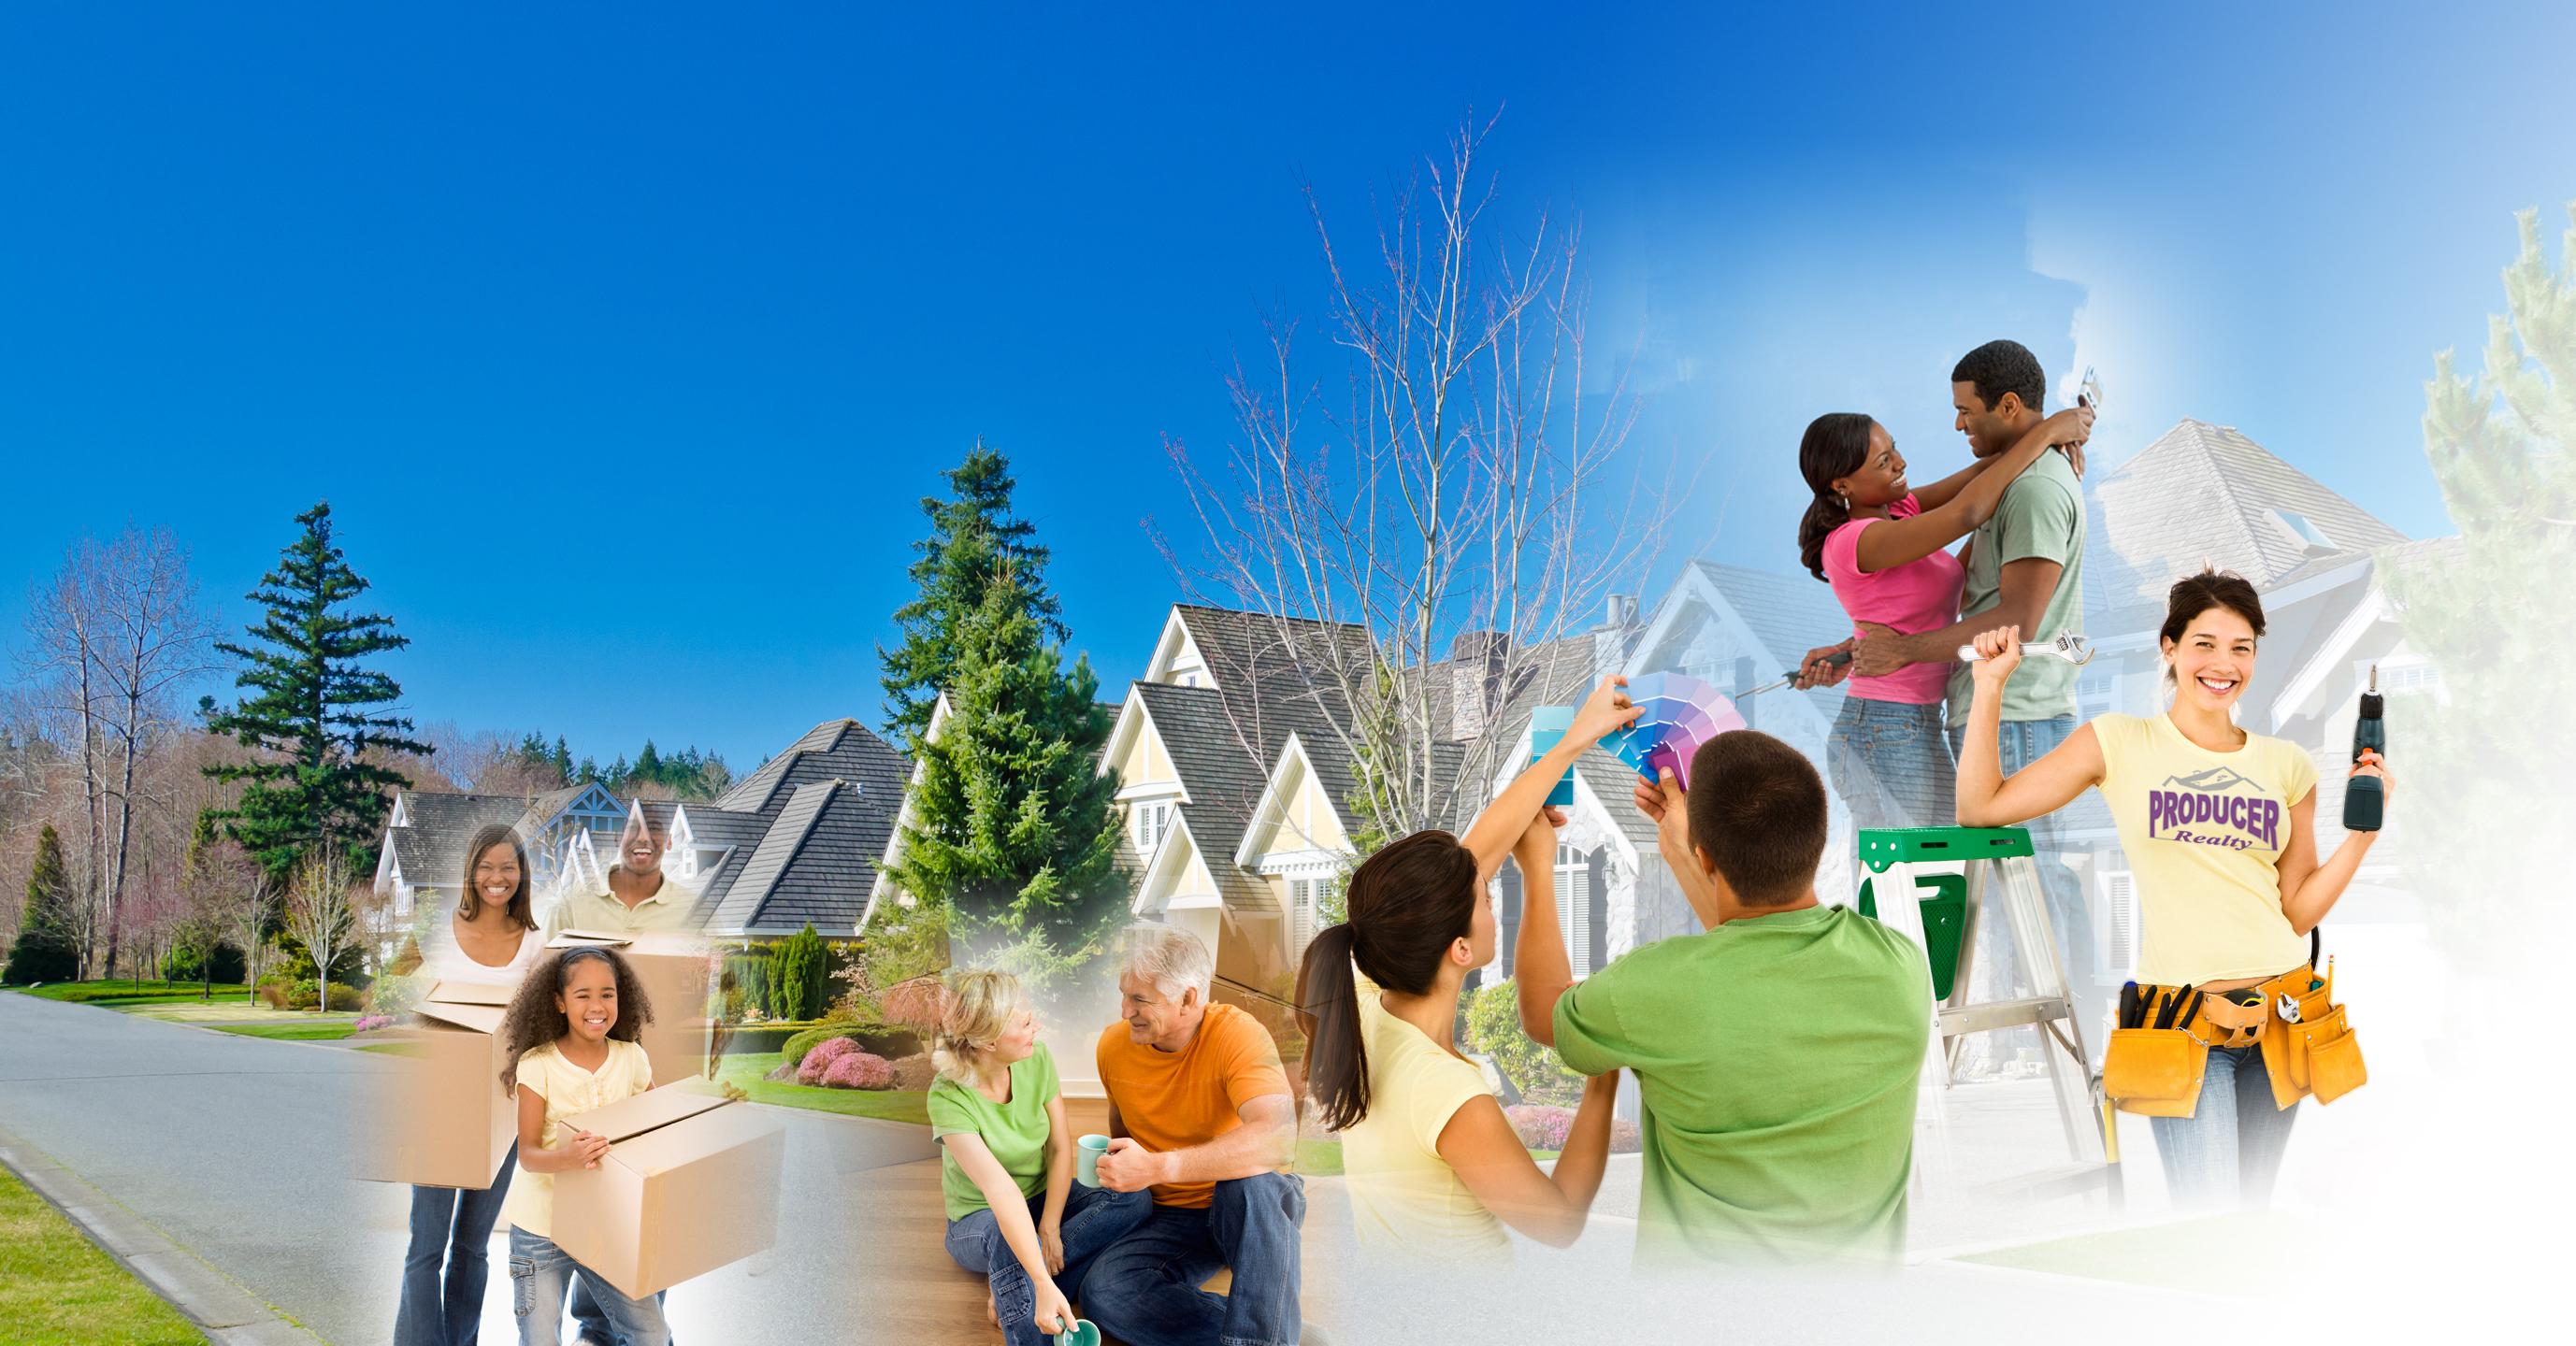 Greer Sc Zip Code Map.Greenville Sc Zip Codes Homes For Sale By Zip Code Maps